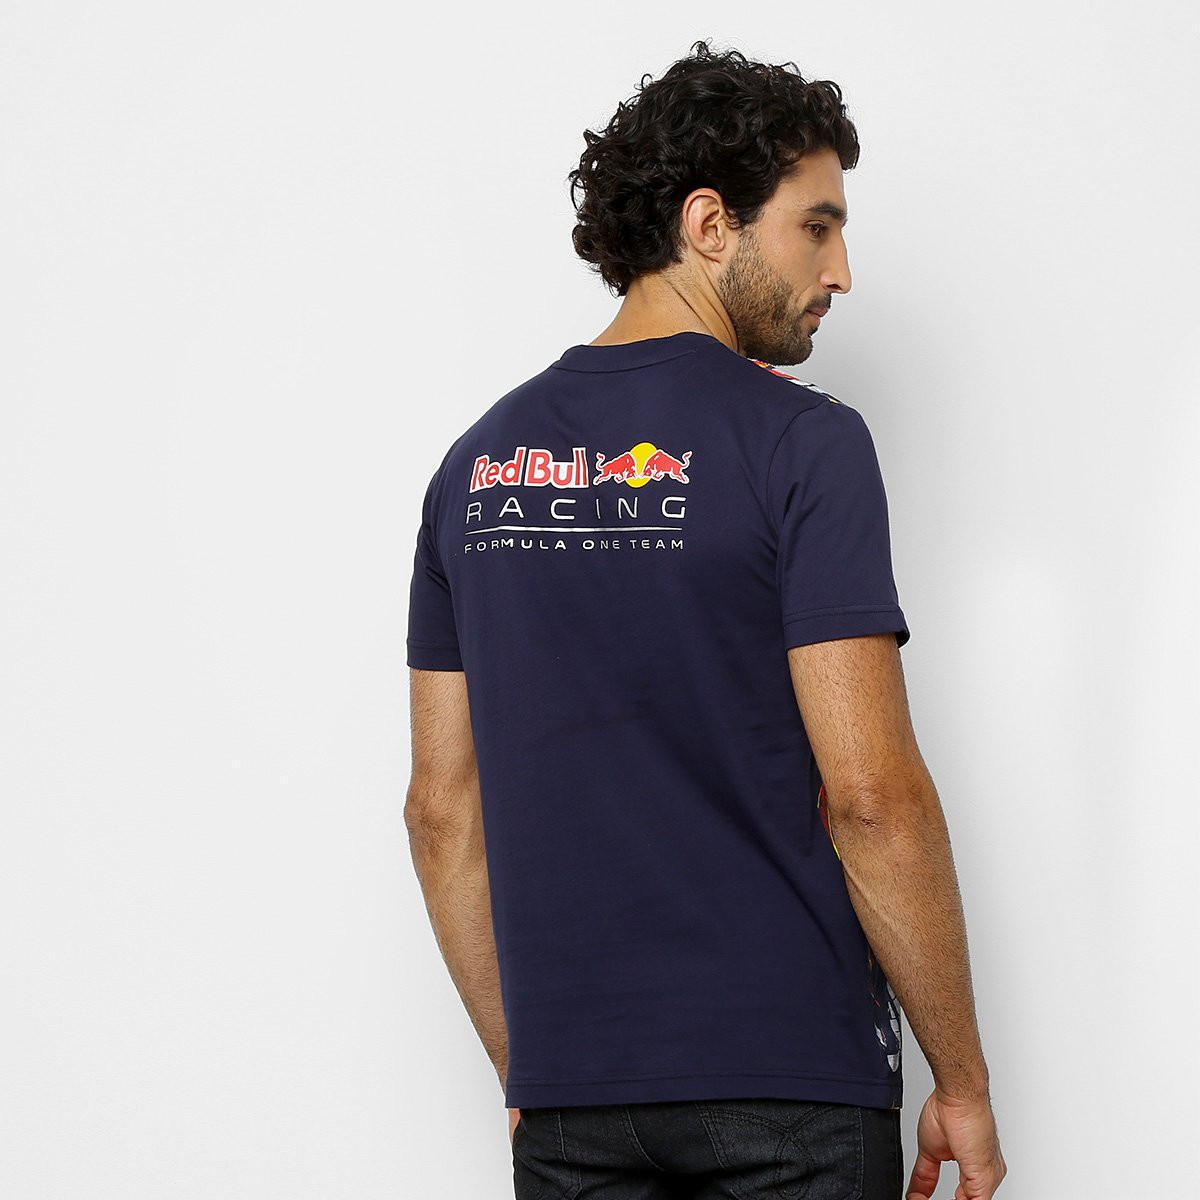 577aa89a15533 Camiseta Puma Red Bull Racing AOP Tee Masculina - Shopping TudoAzul